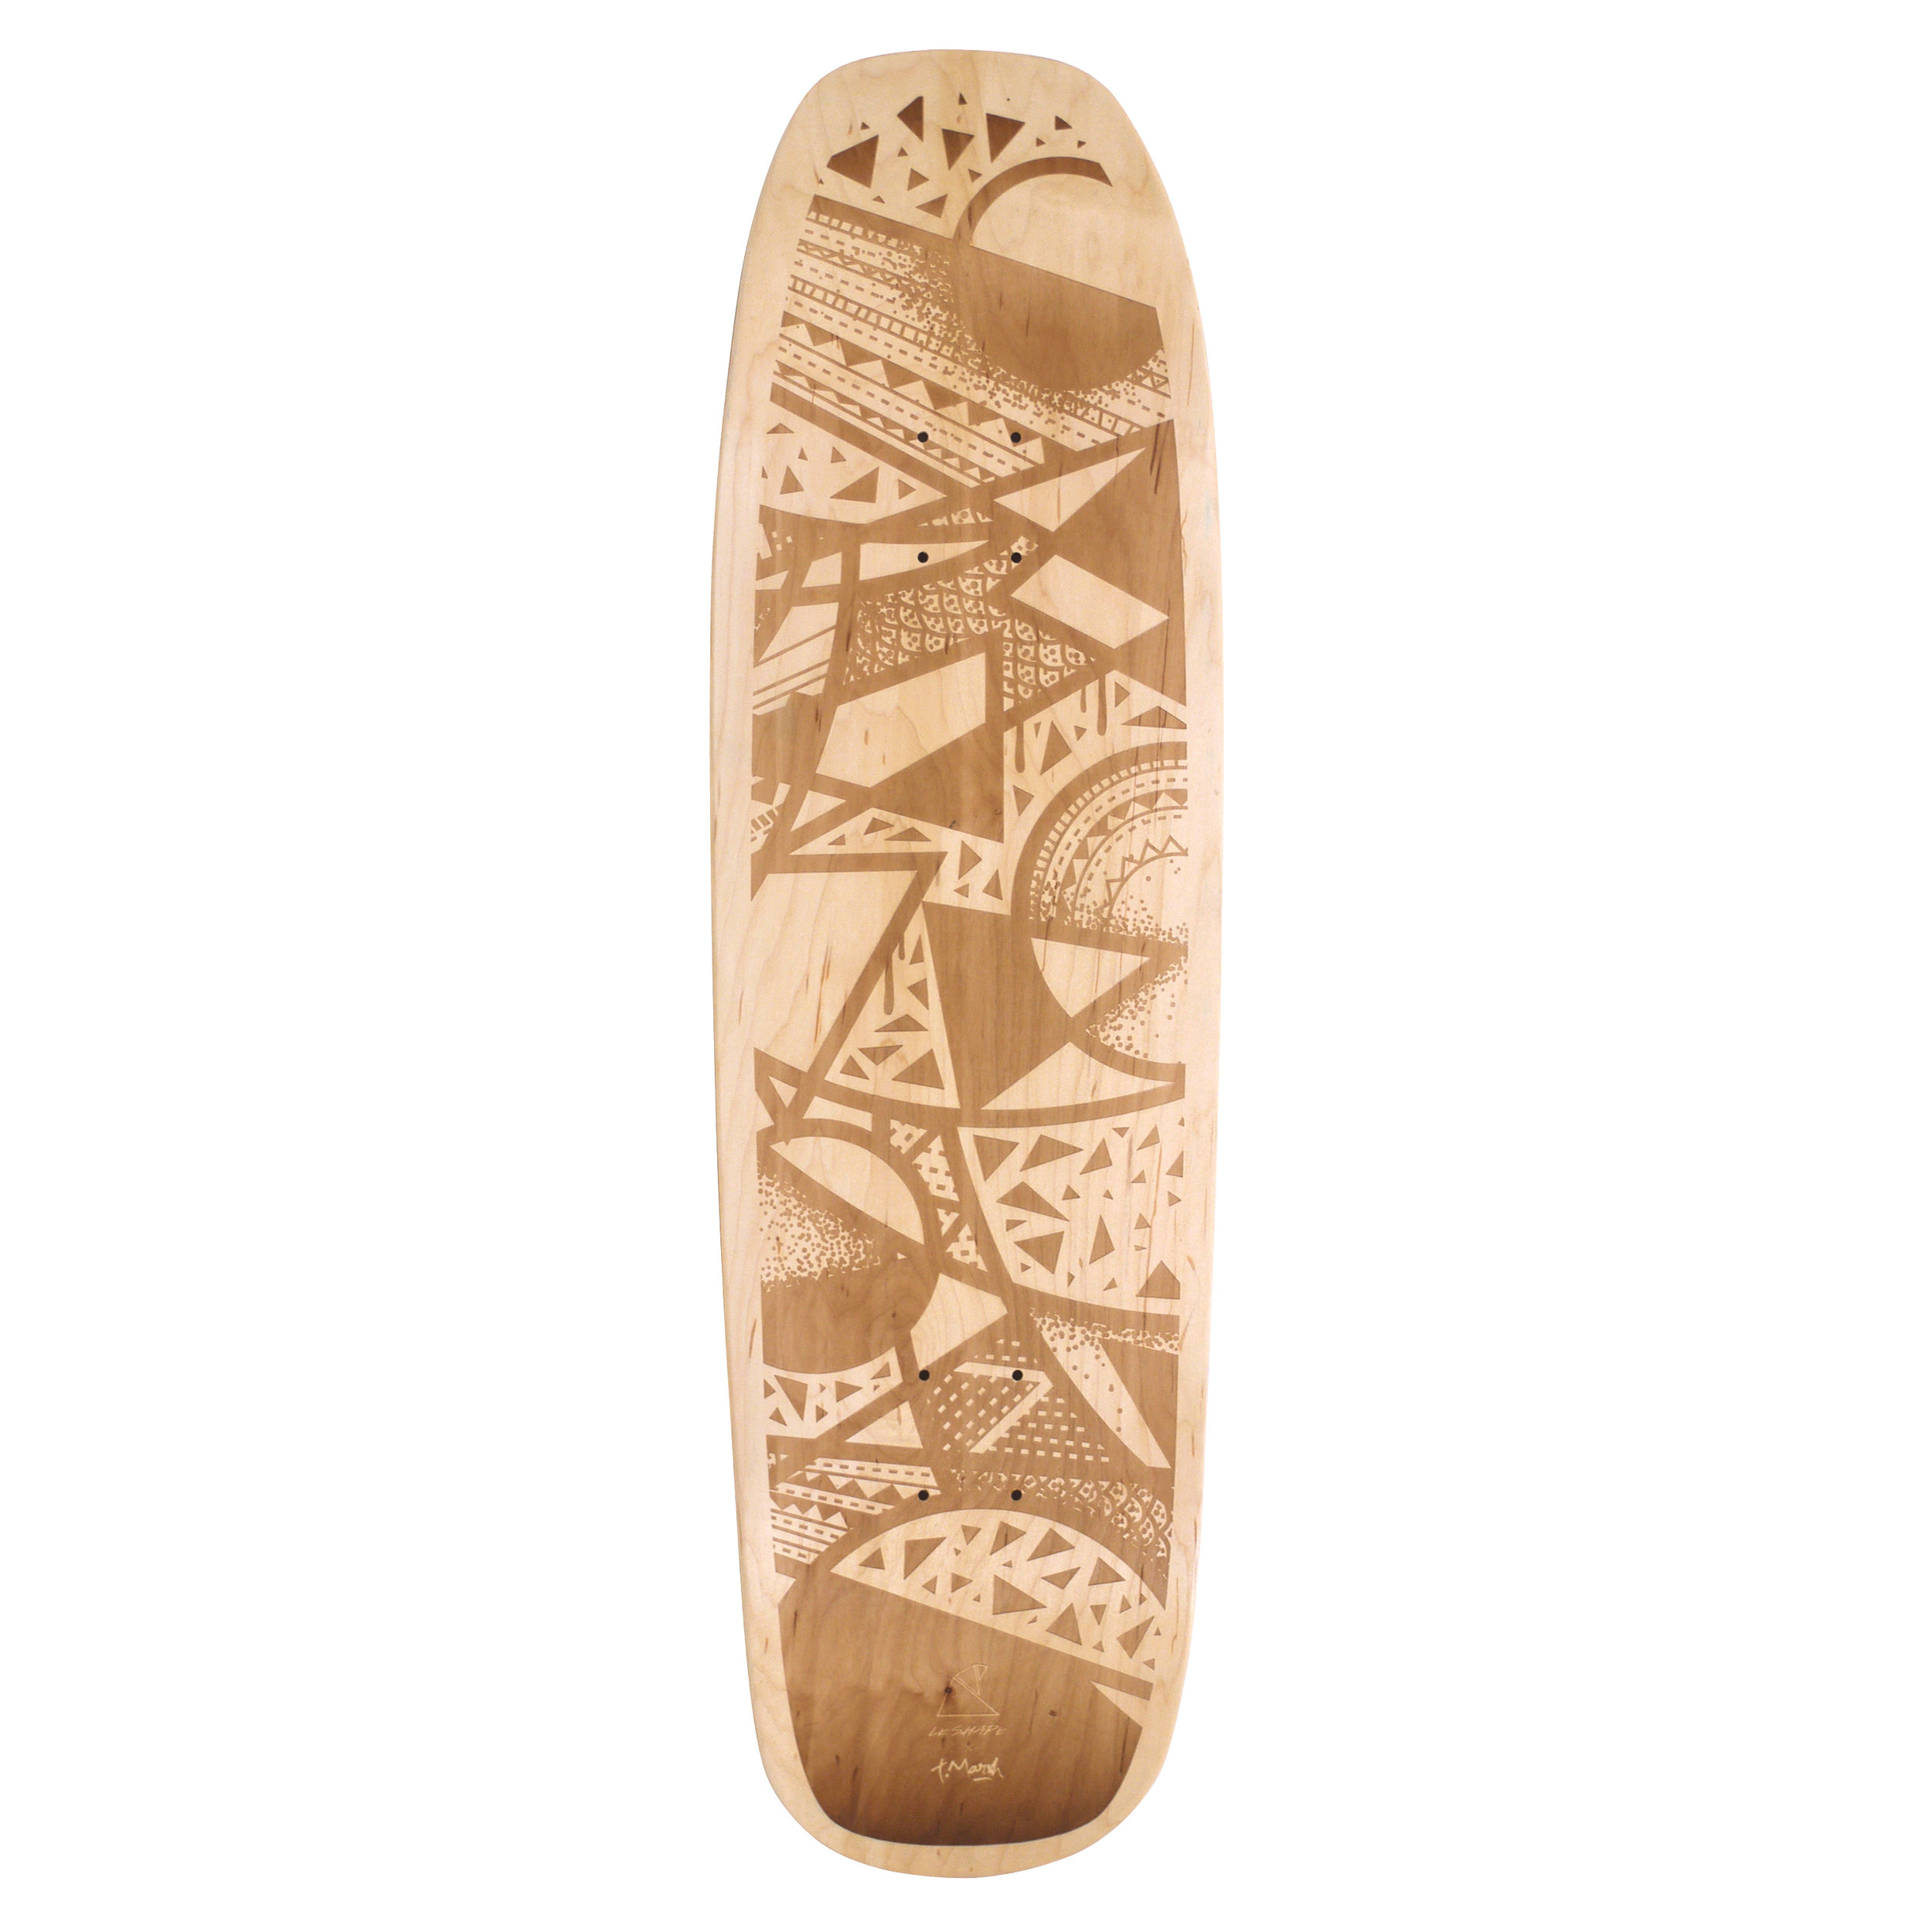 skateboard tim marsh with le shape